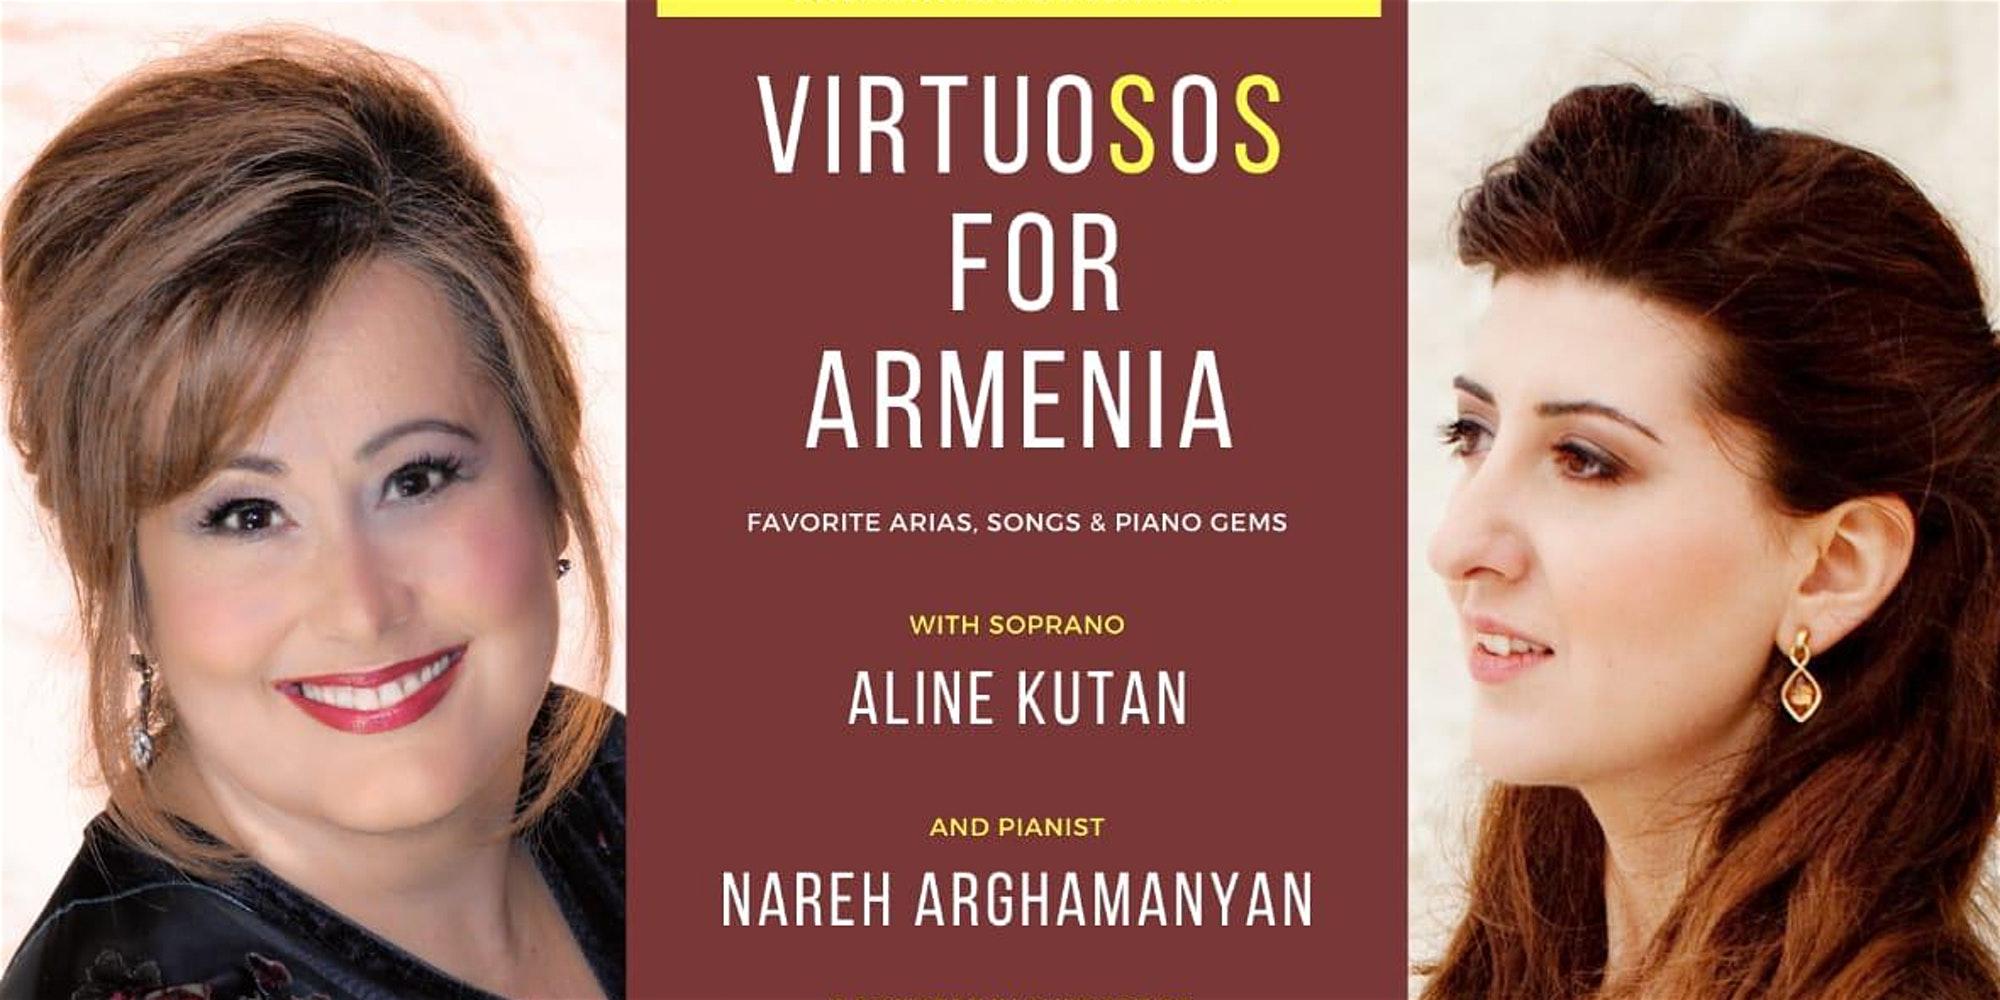 Virtuosos for Armenia